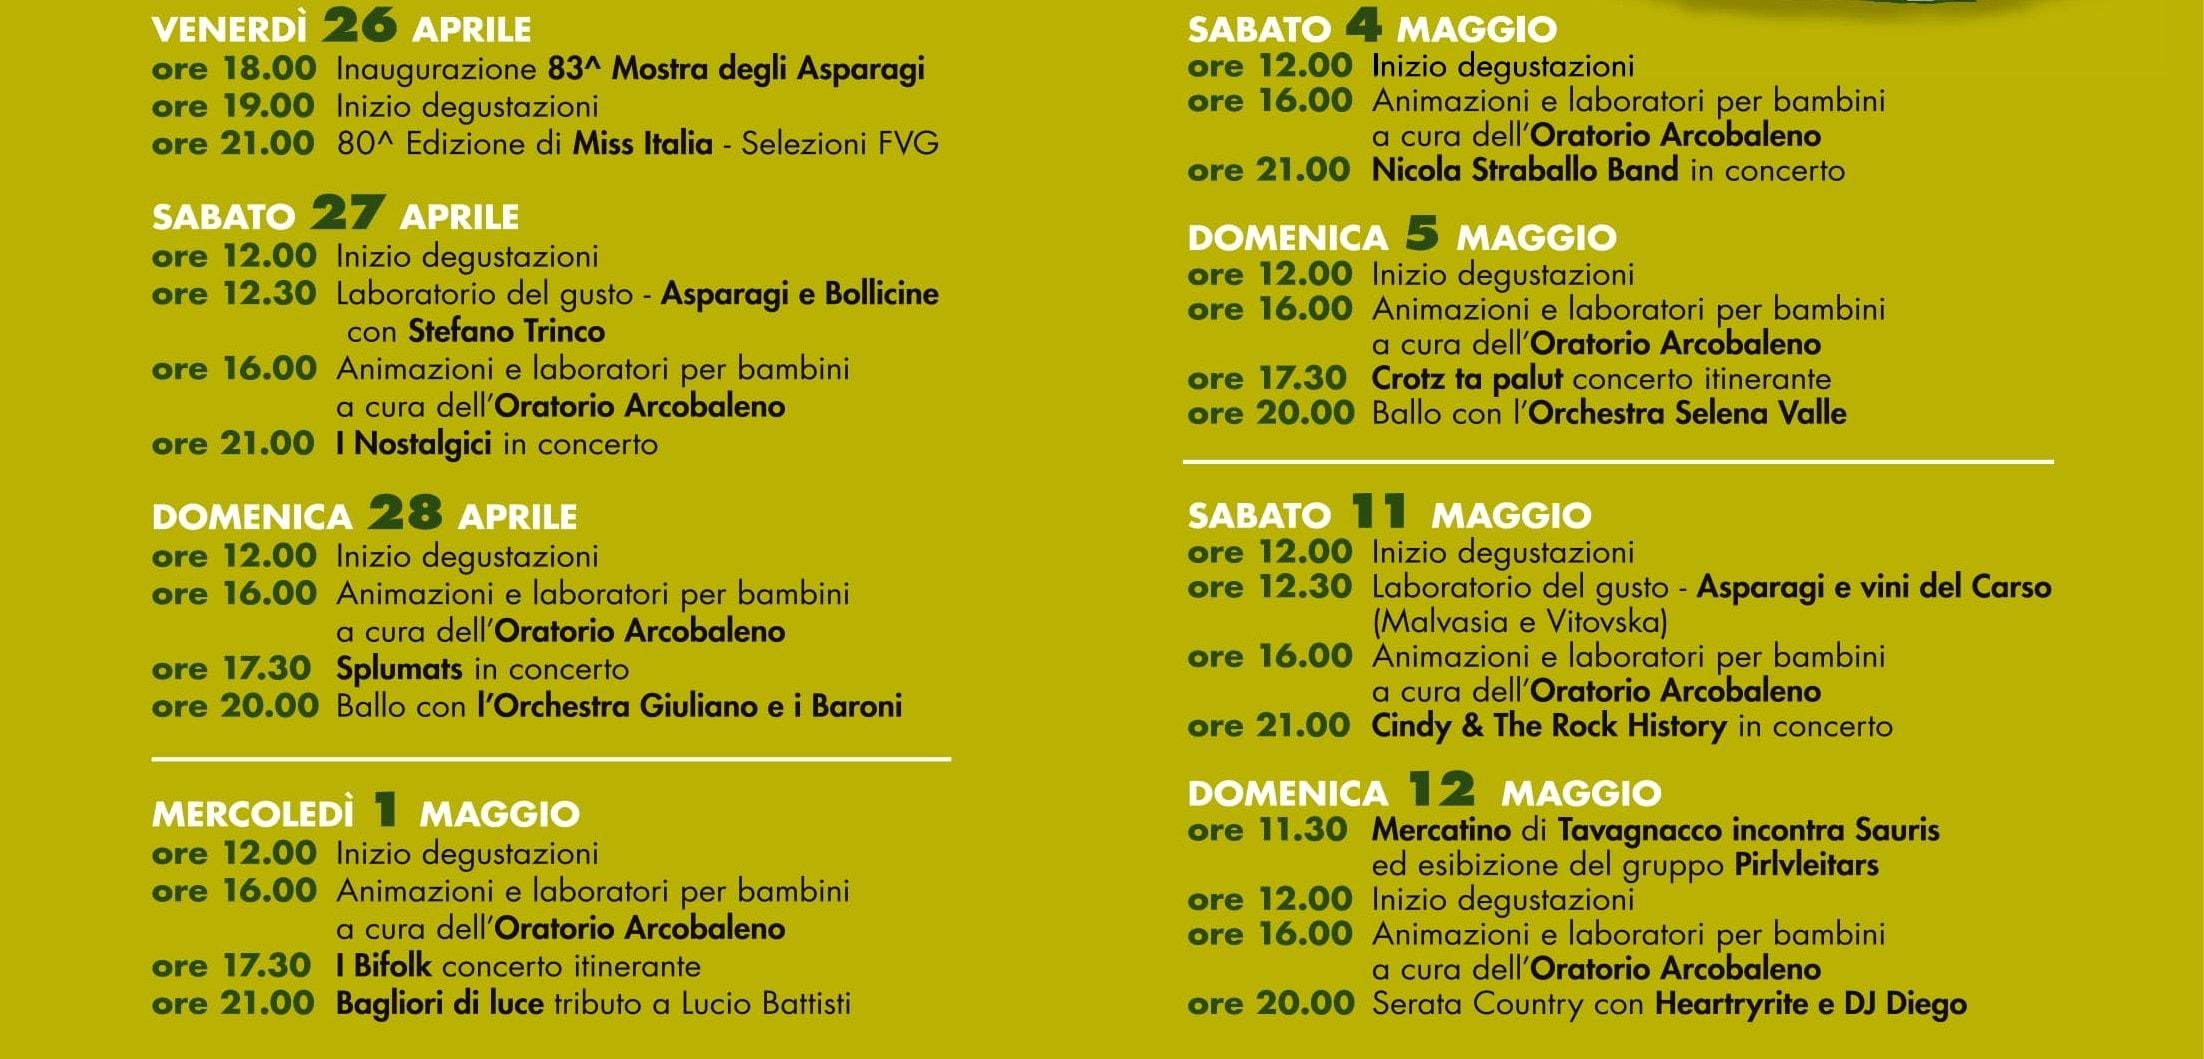 Festa degli asparagi 2019 Tavagnacco-2